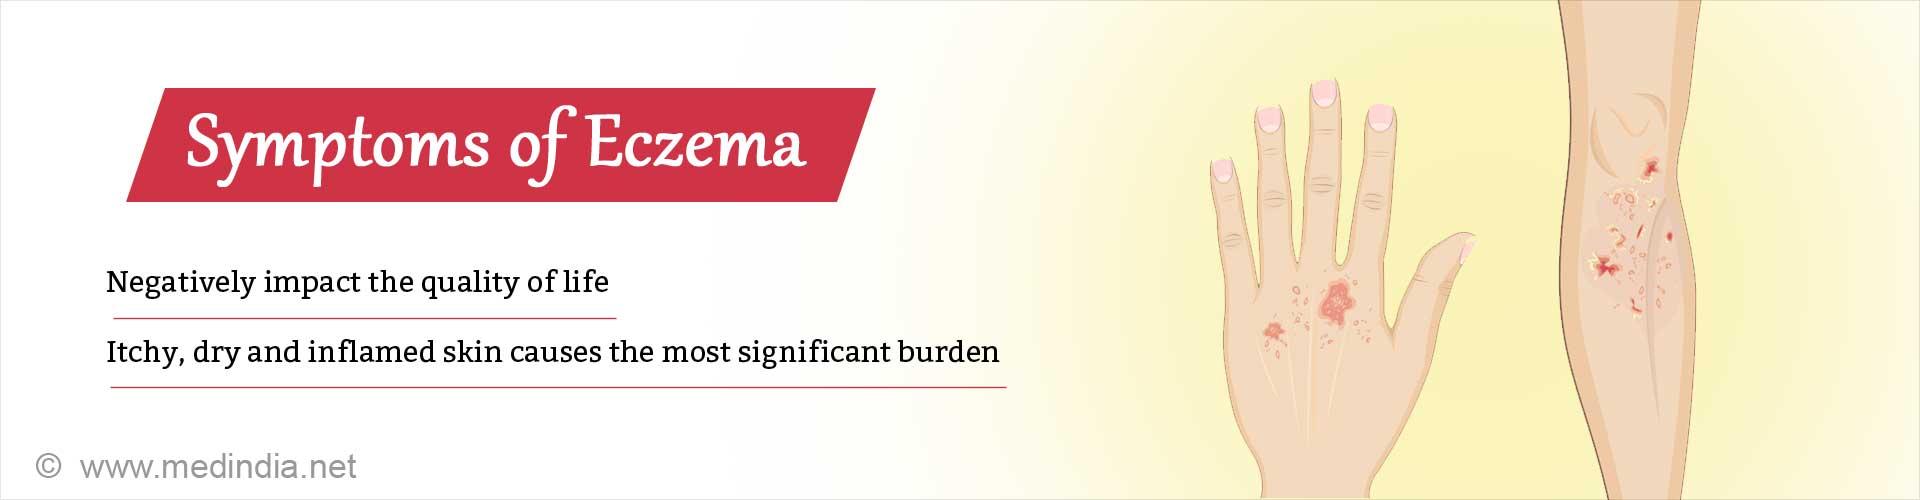 Eczema Impacts Quality of Life More Than Chronic Illnesses Like Heart Disease